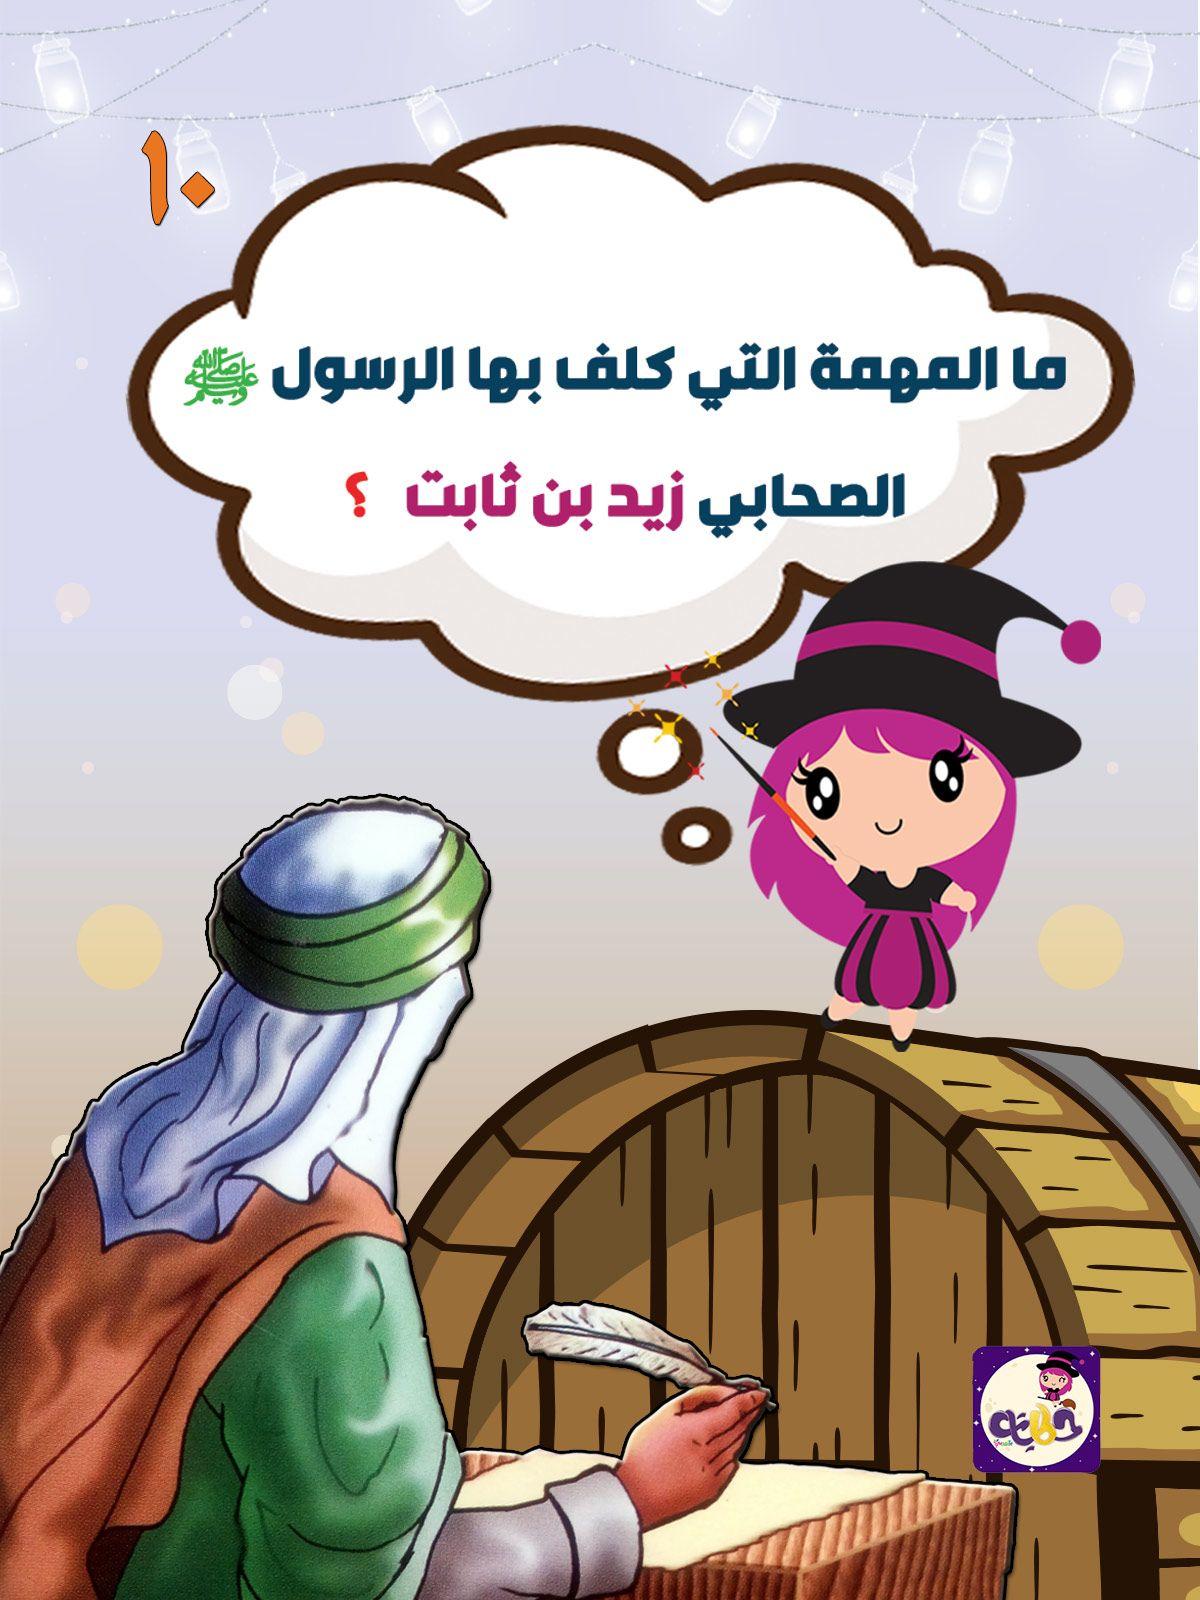 قصة زيد بن ثابت بالعربي نتعلم Fictional Characters Family Guy Character